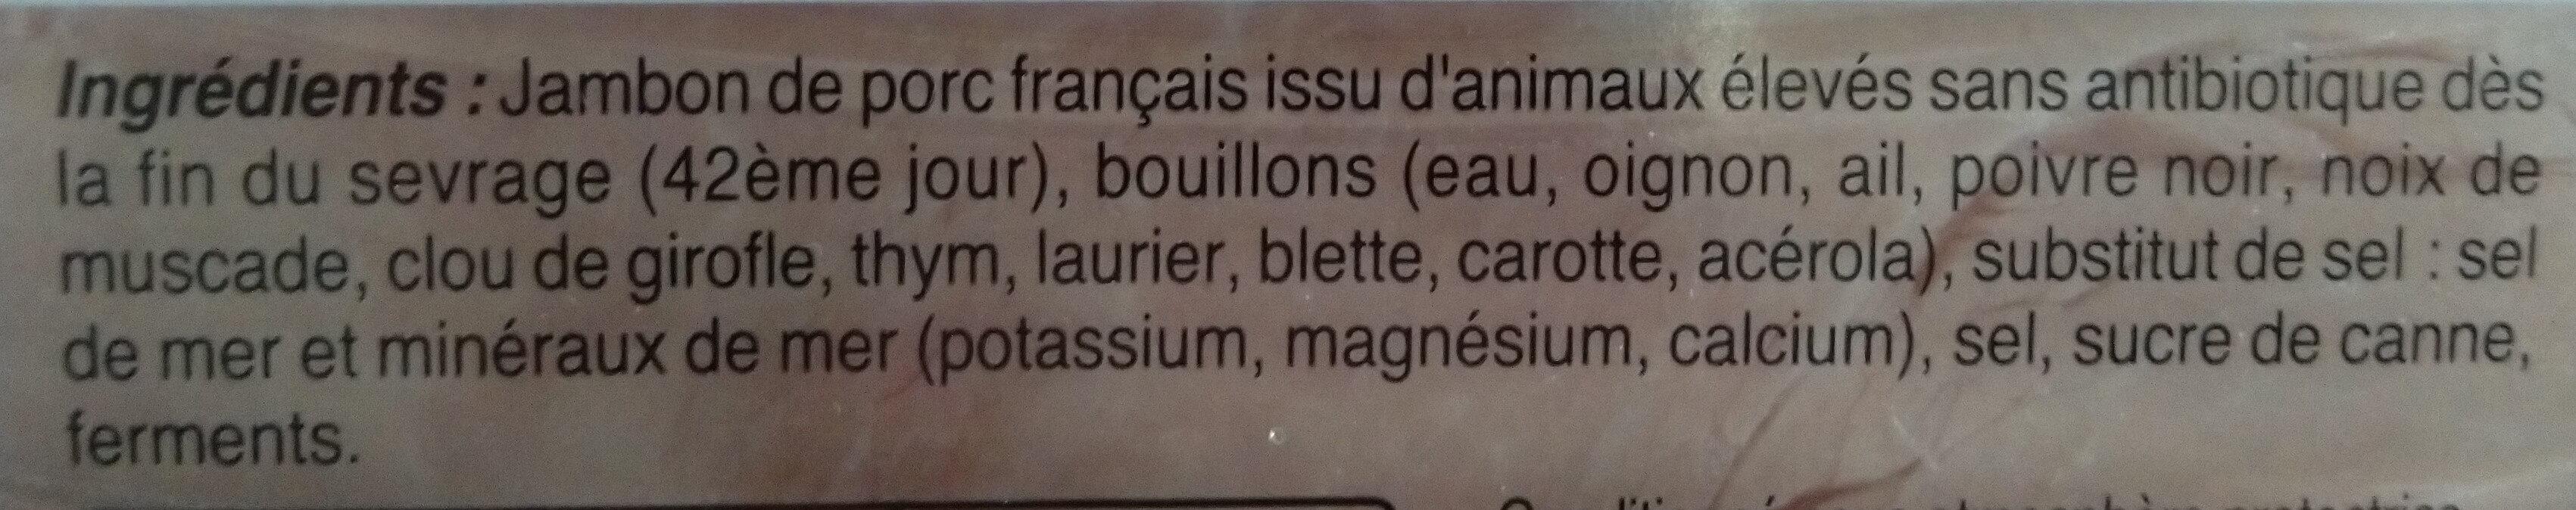 Mon Jambon blanc -25% de sel* - Ingrediënten - fr